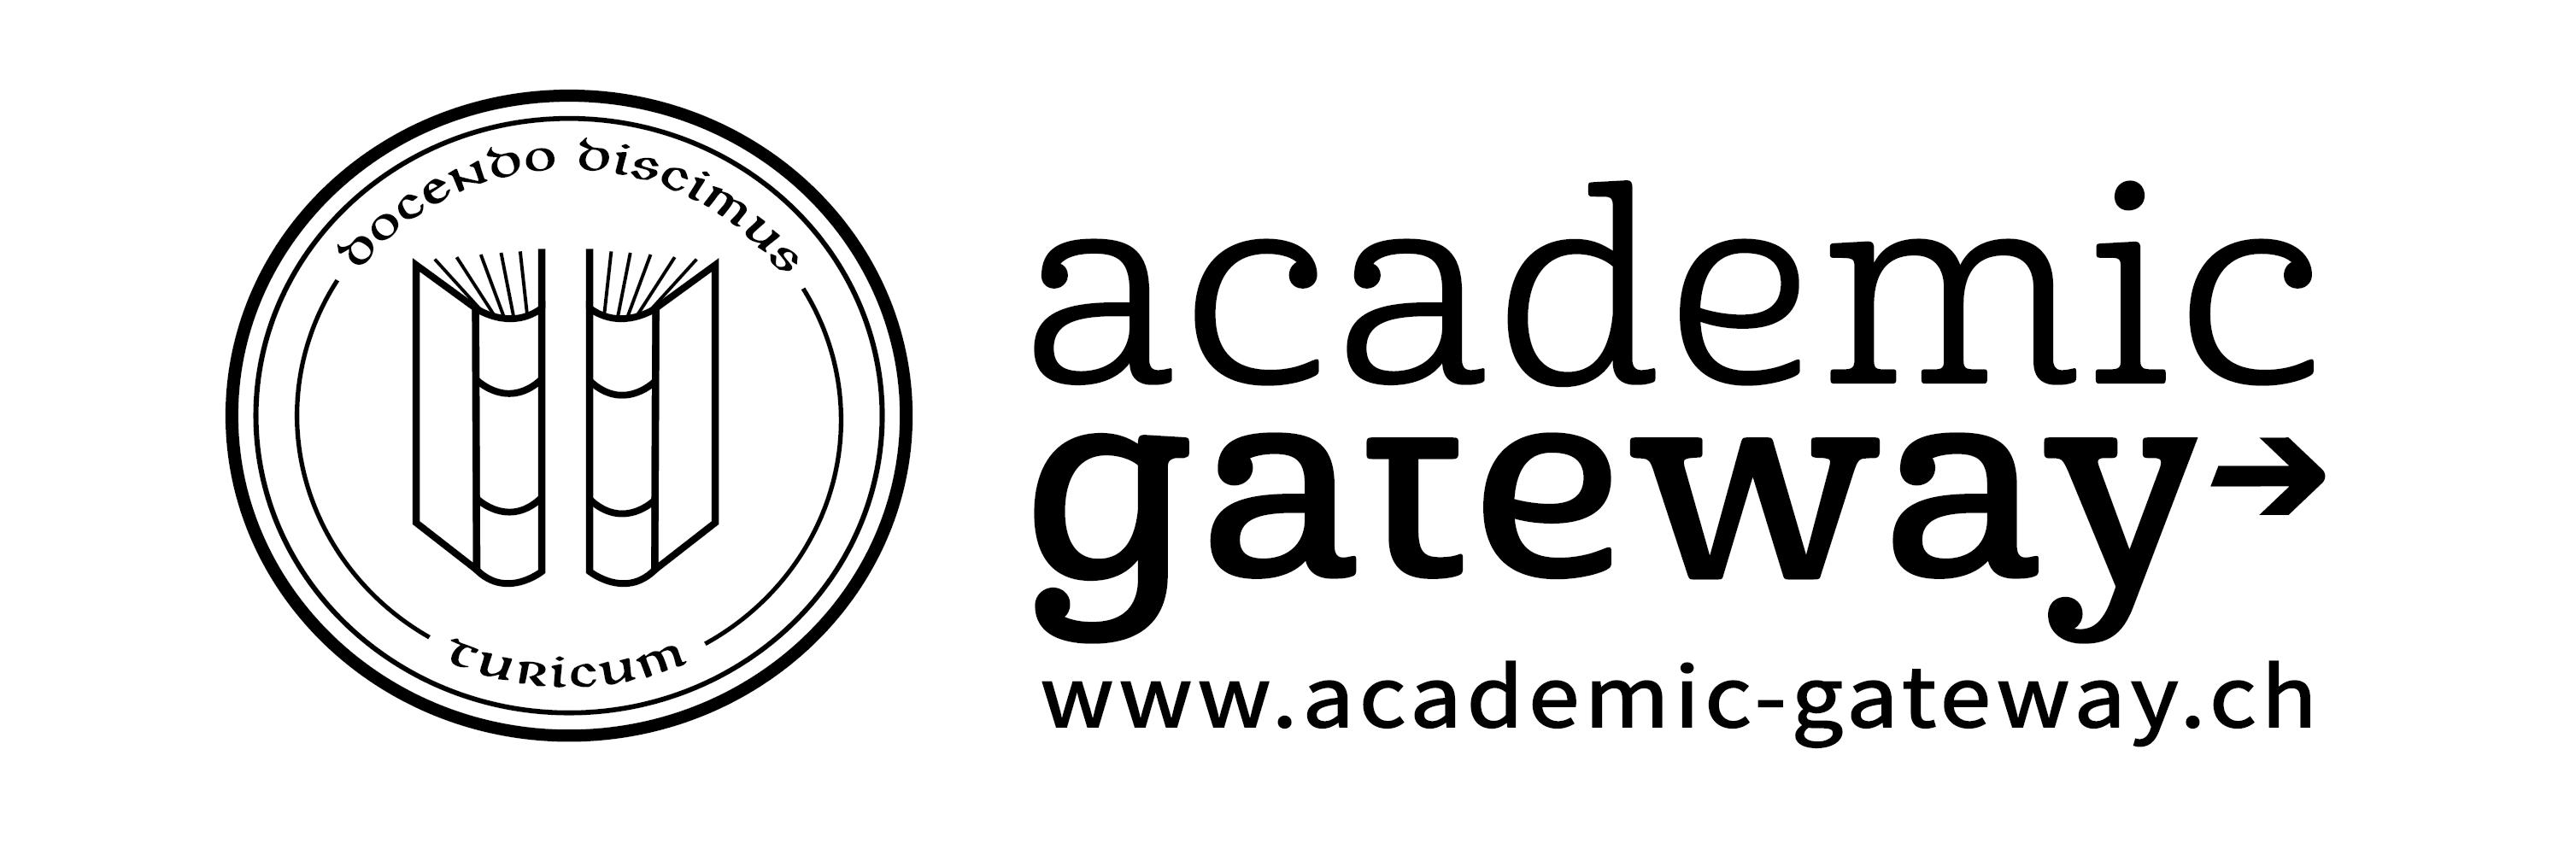 Immagine Academic Gateway